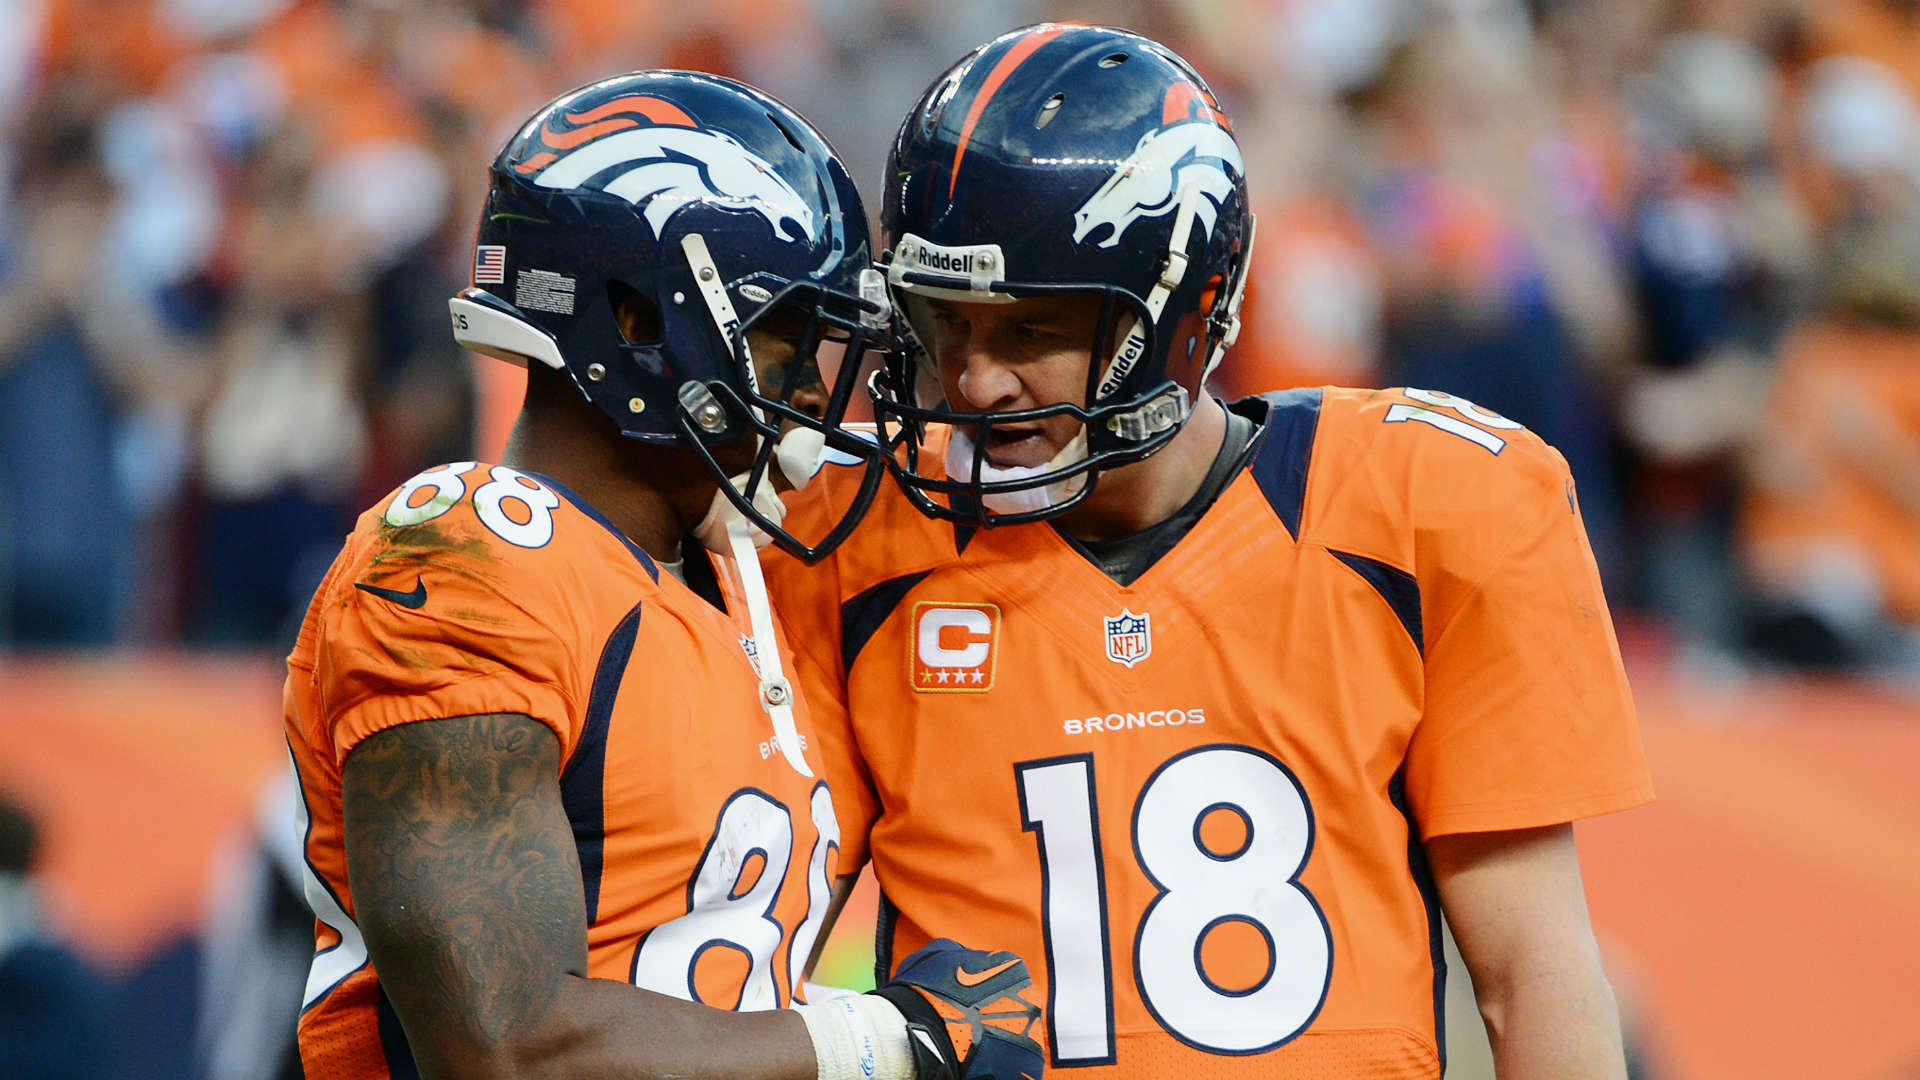 Universal Orlando fields Peyton Manning as its 'Vacation Quarterback'